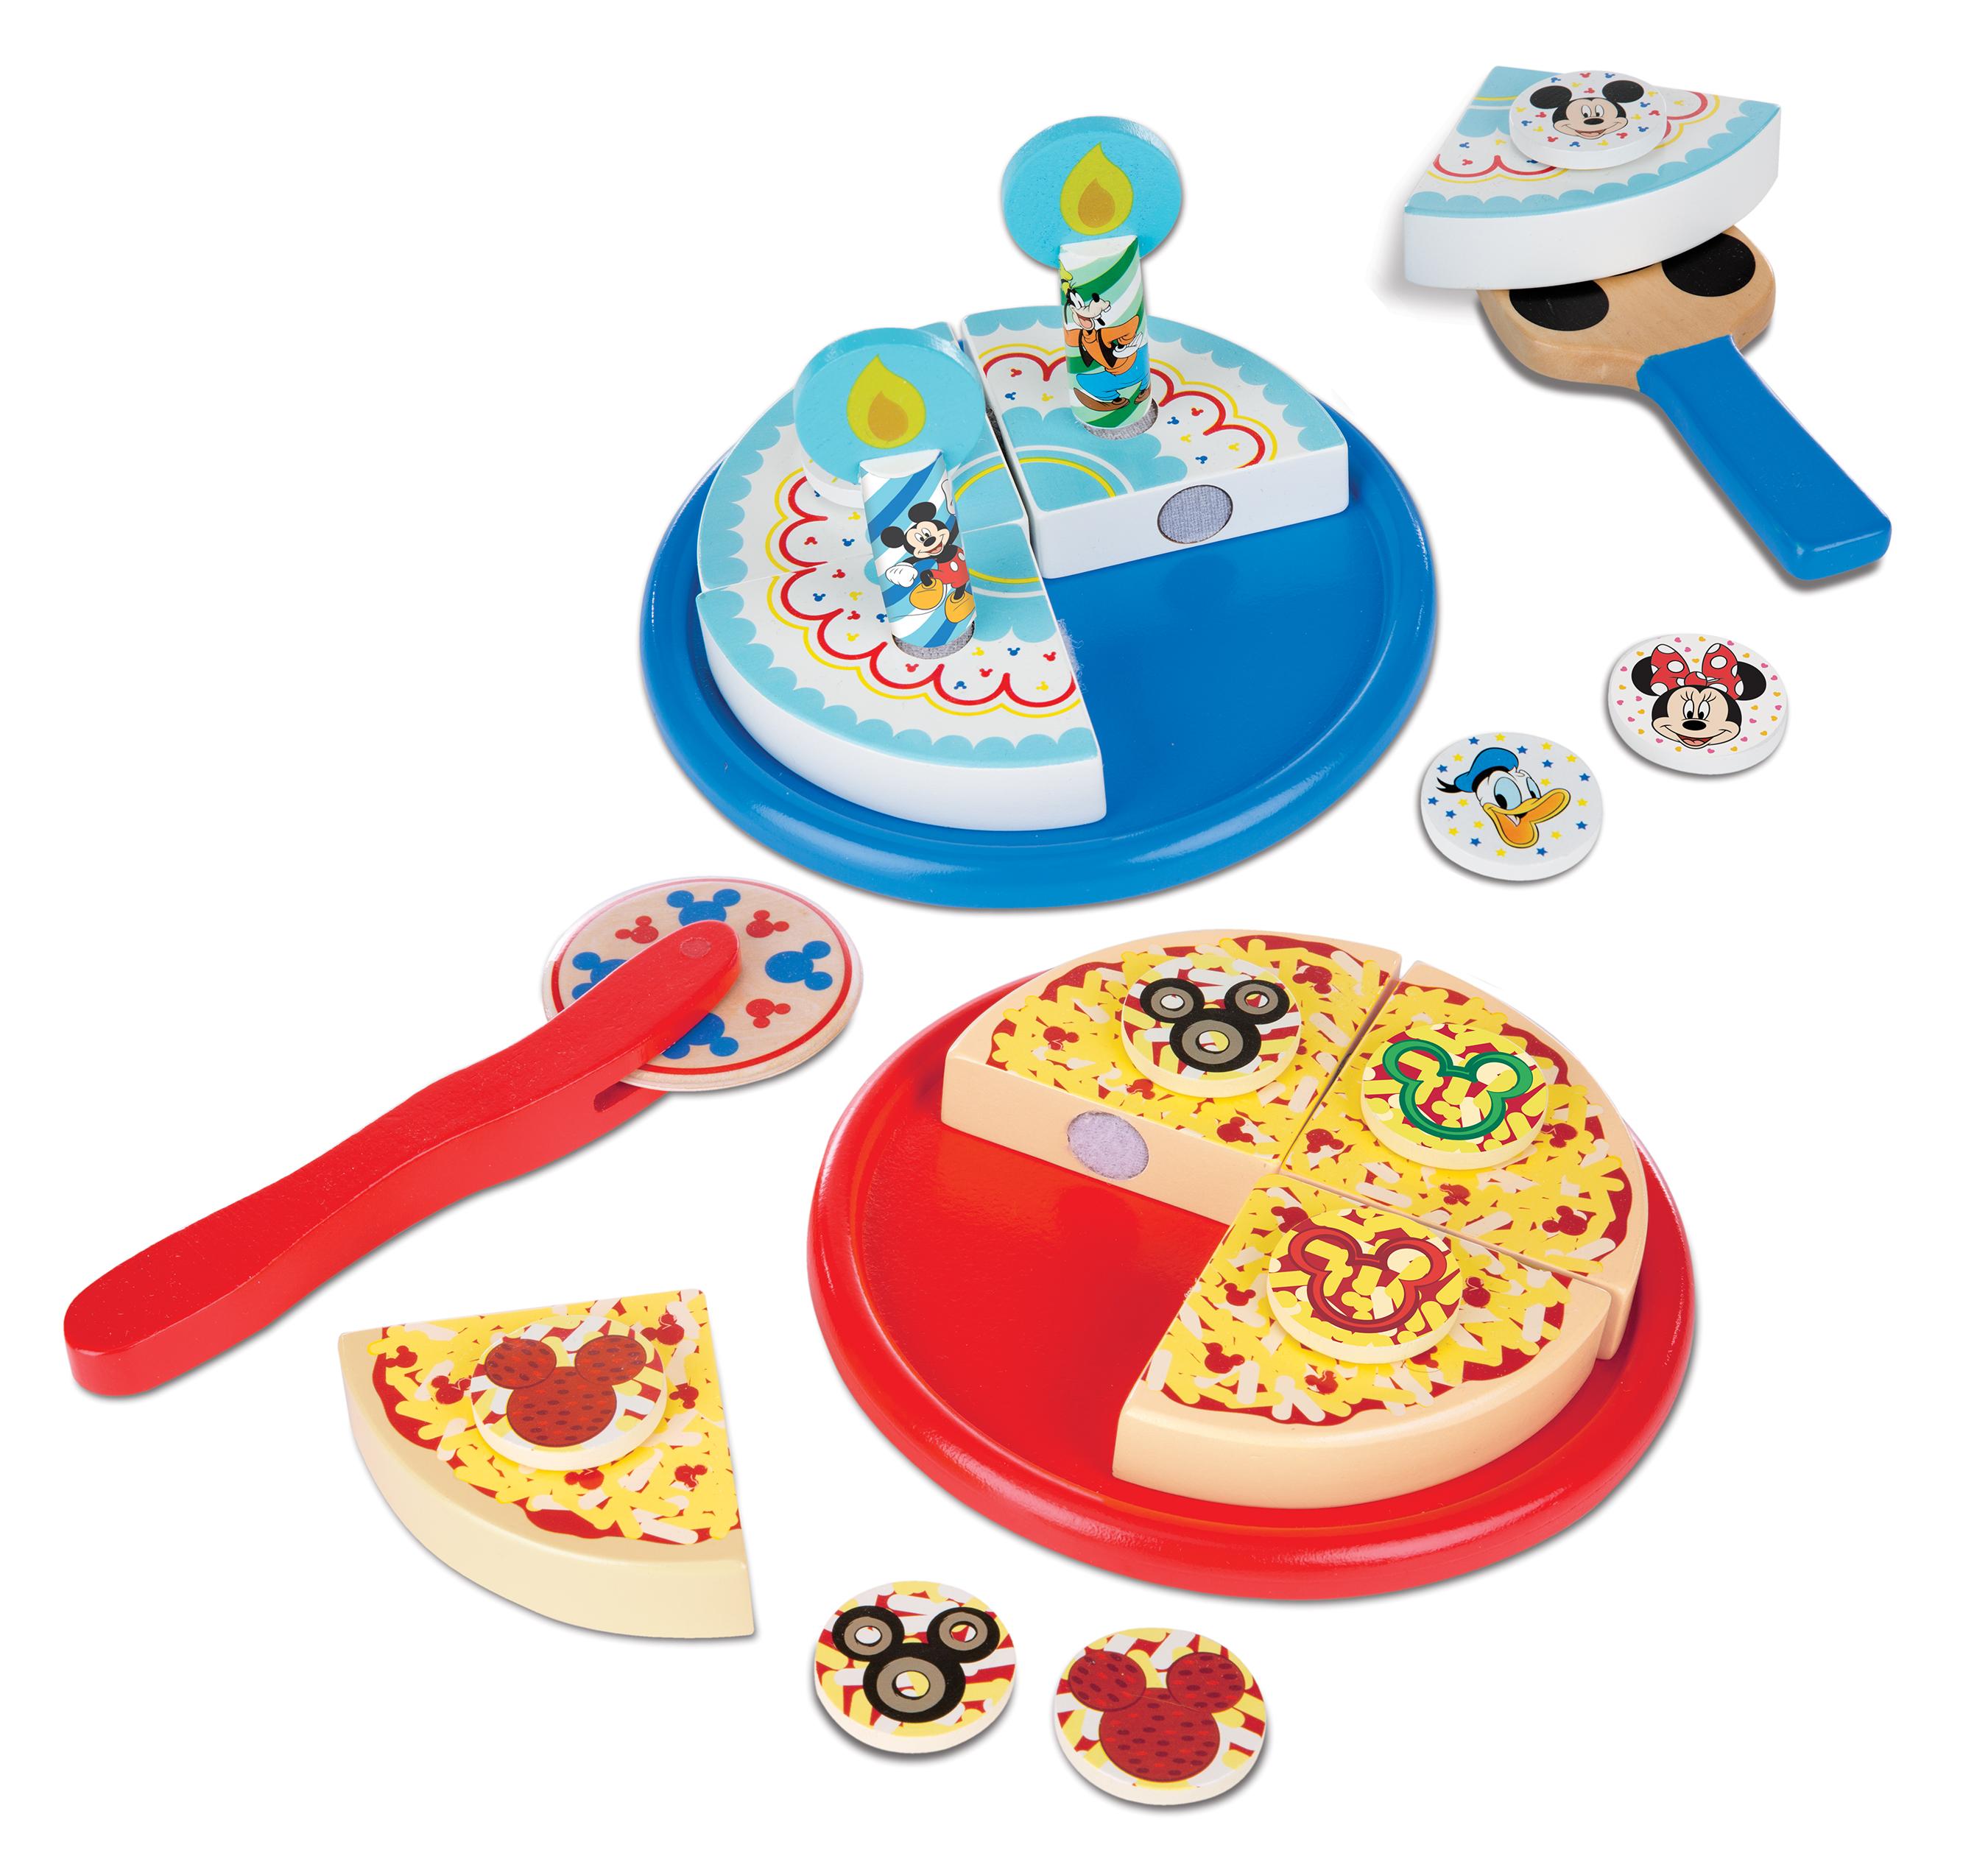 Melissa Amp Doug Mickey Mouse Pizza And Cake